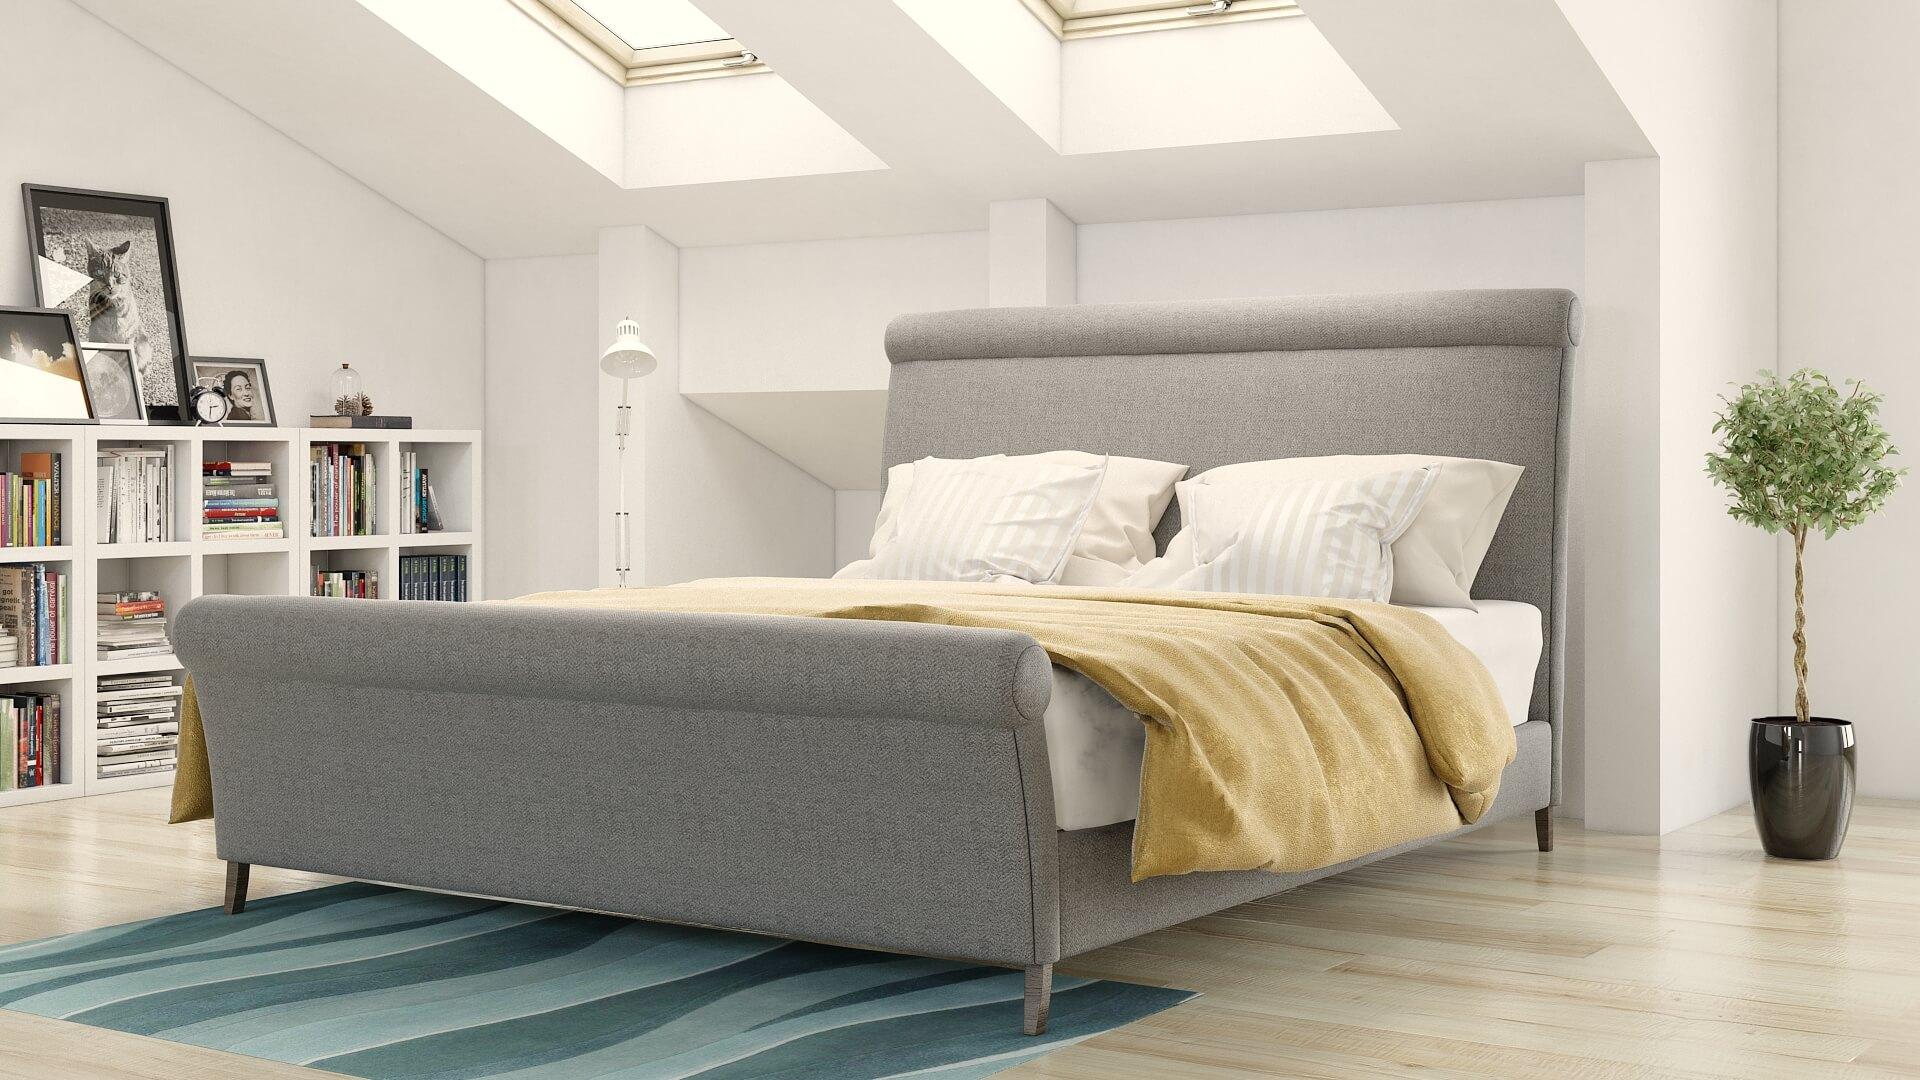 maja bed furniture gallery 5